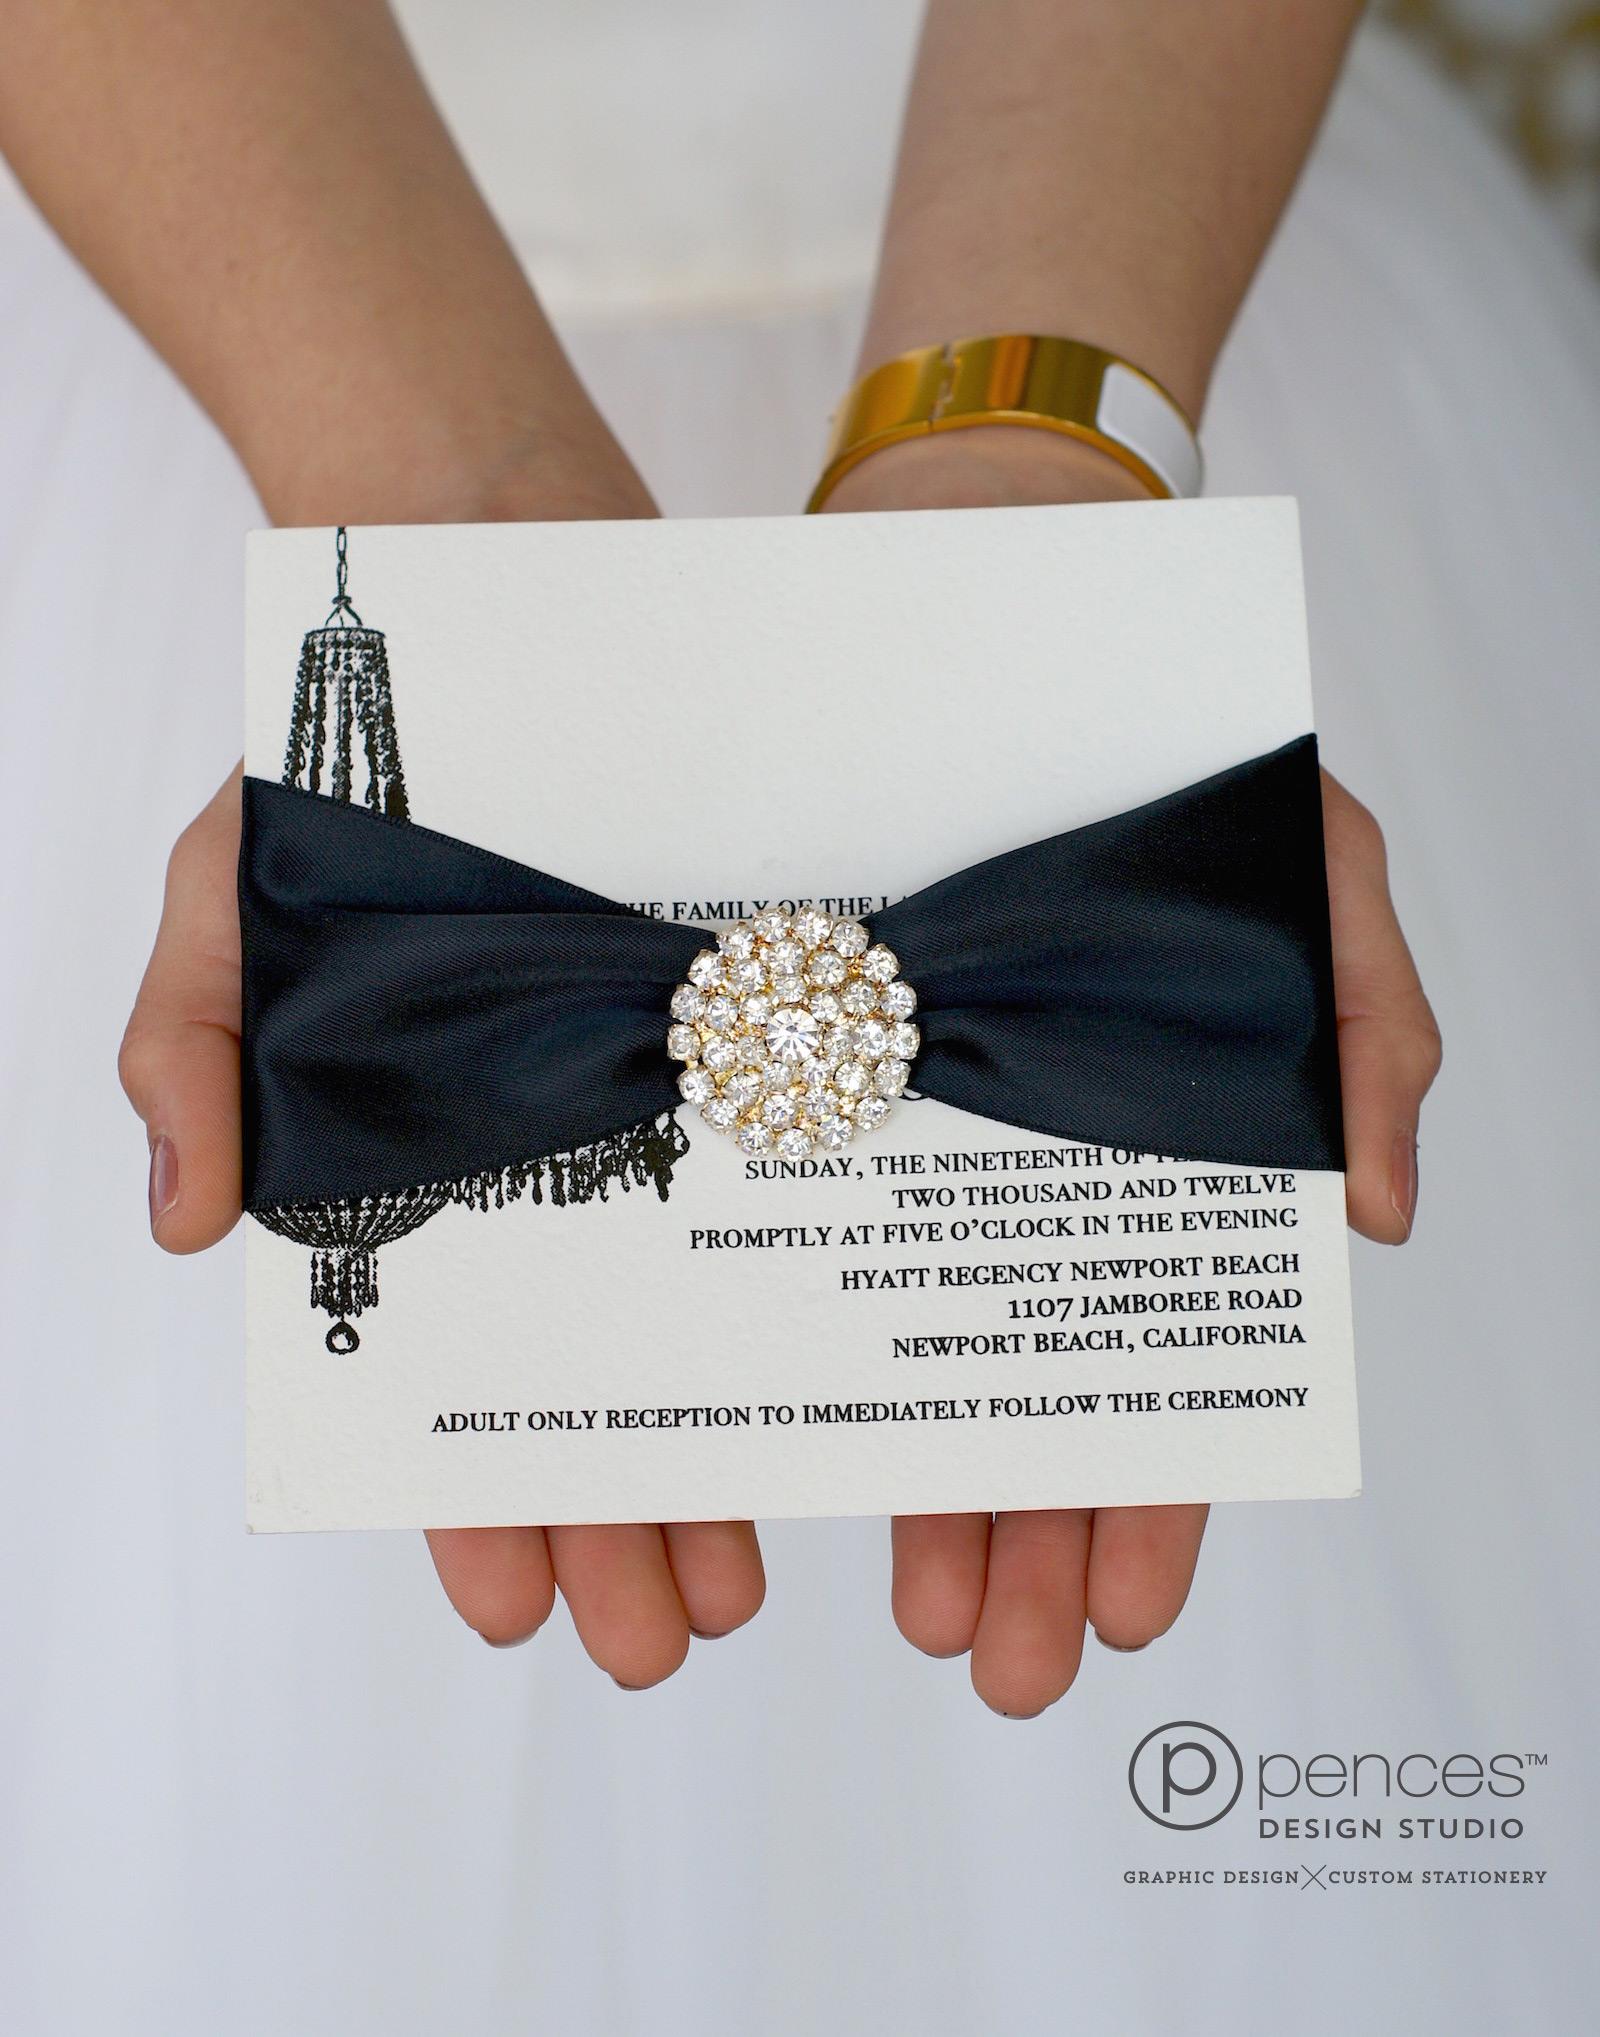 pences-invite19-chandelier.jpg